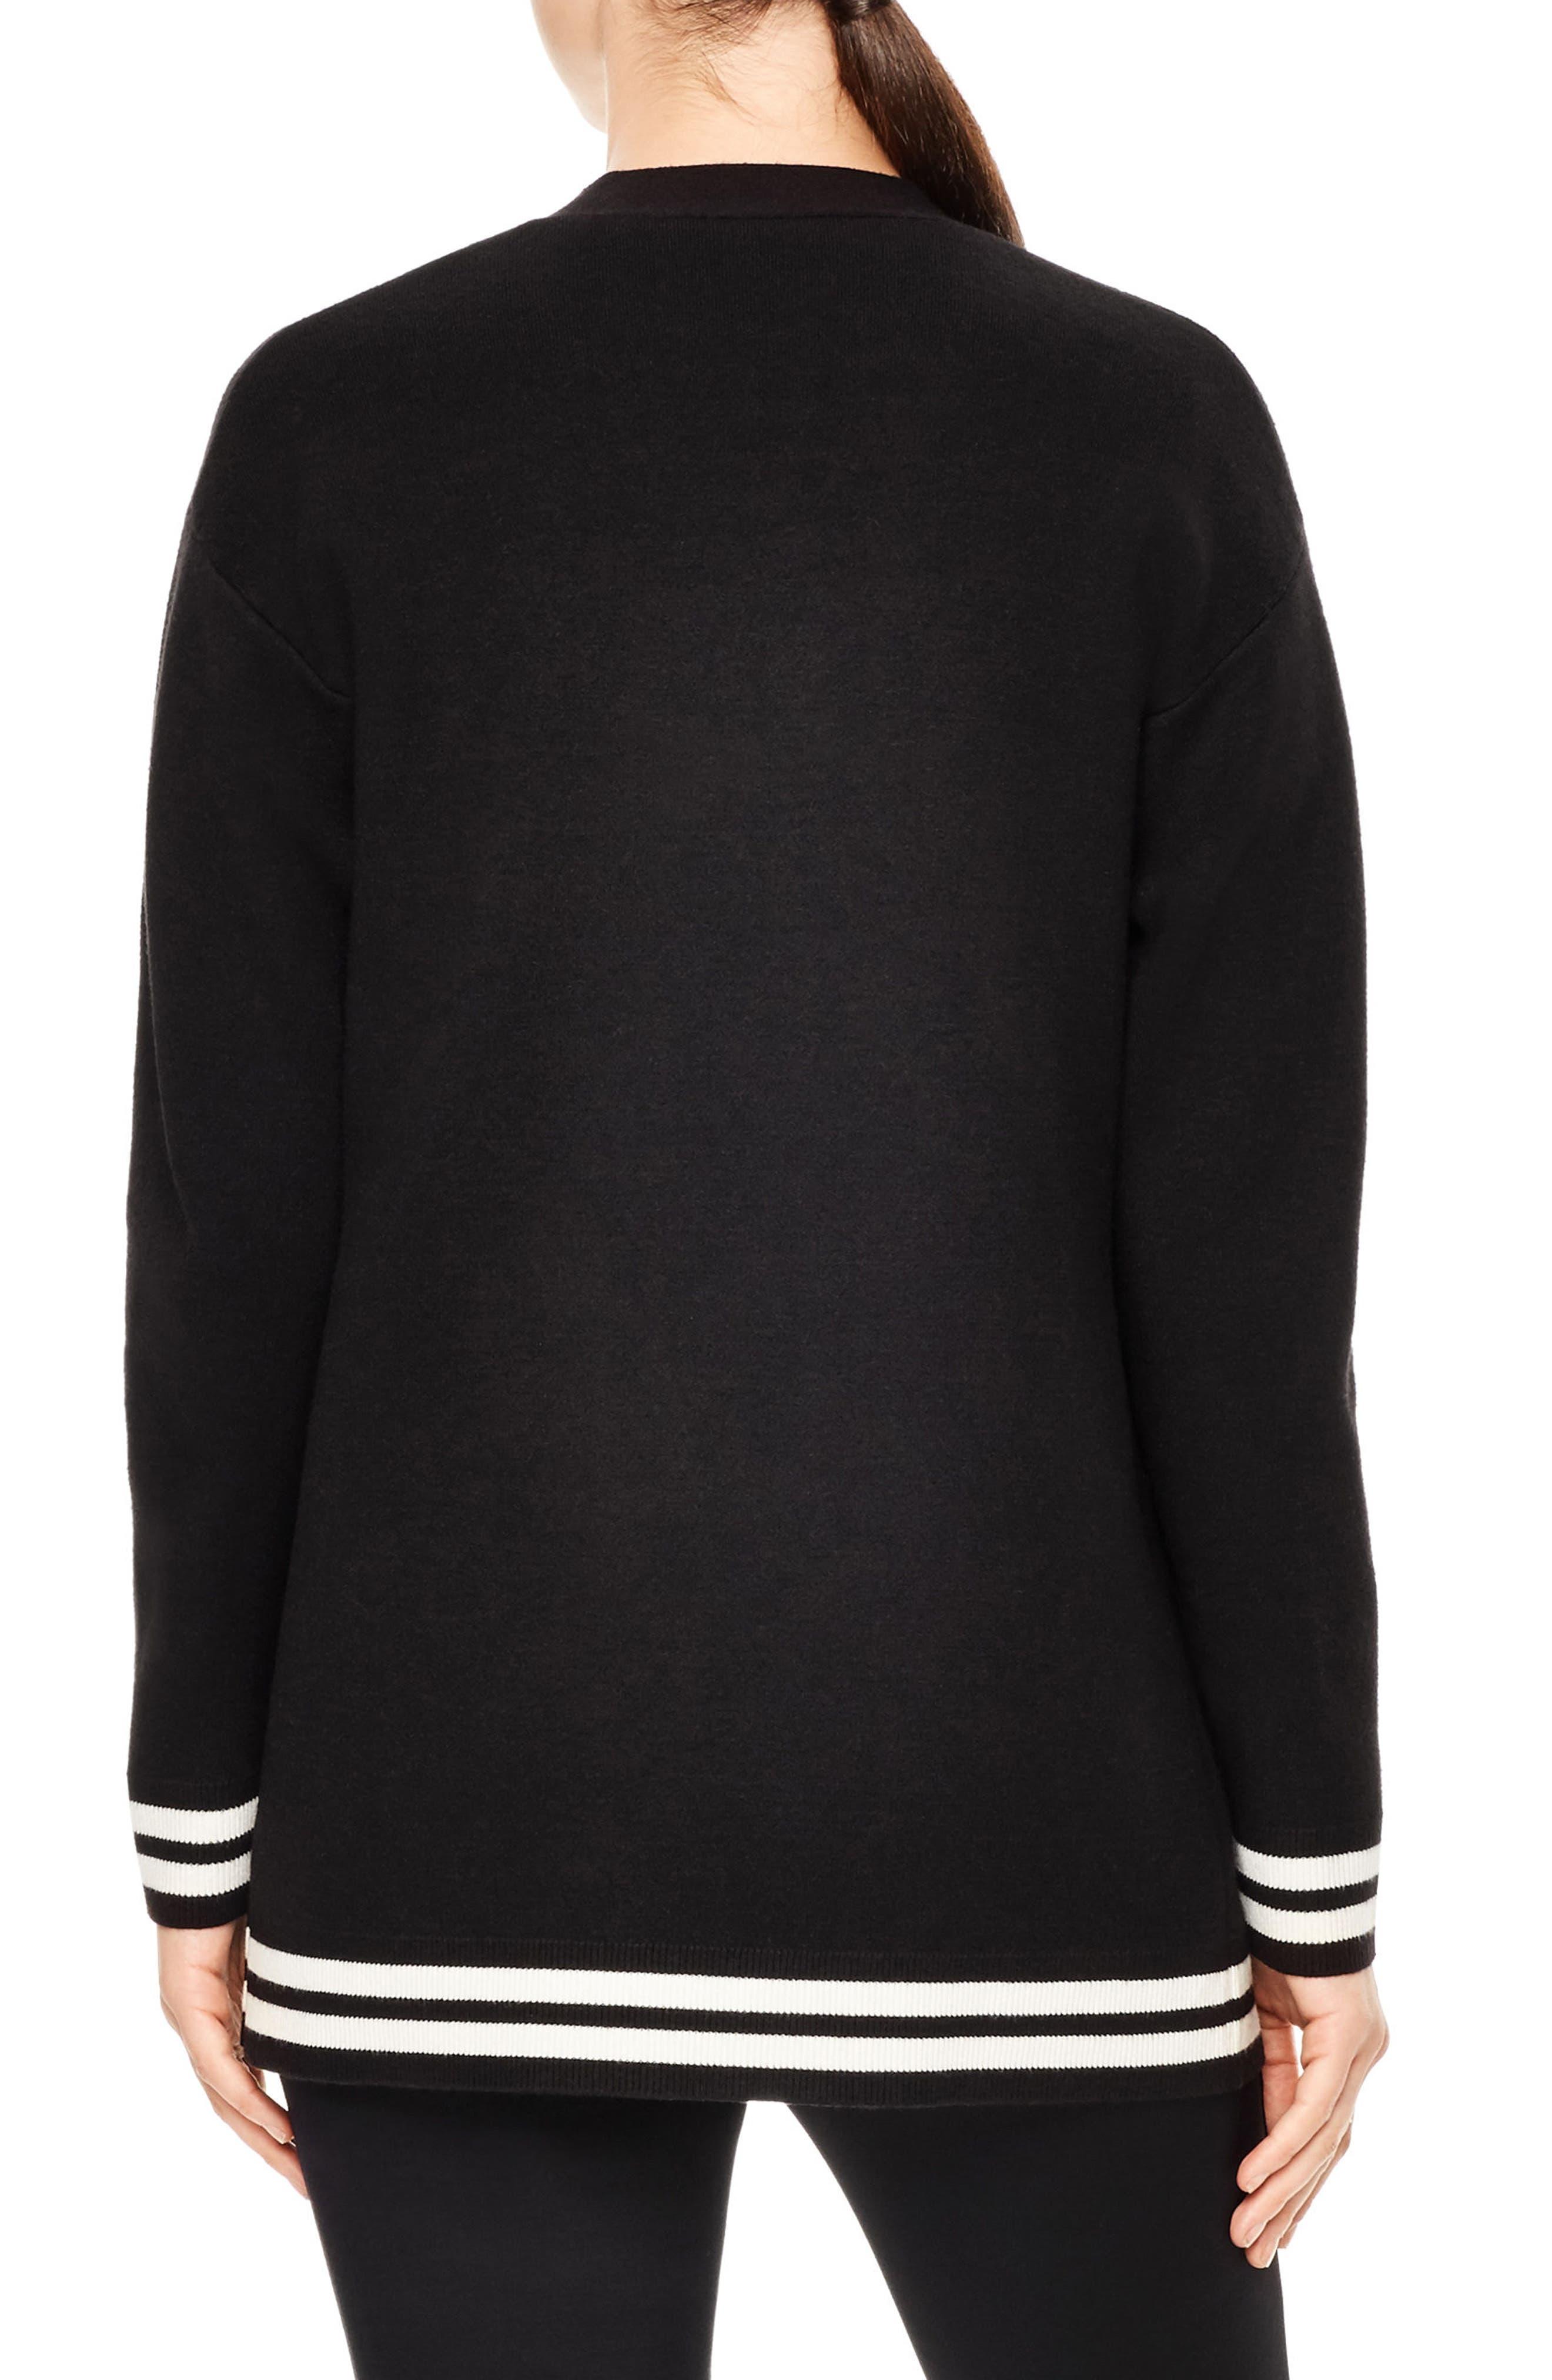 Gorka Embroidered Cardigan,                             Alternate thumbnail 2, color,                             Black